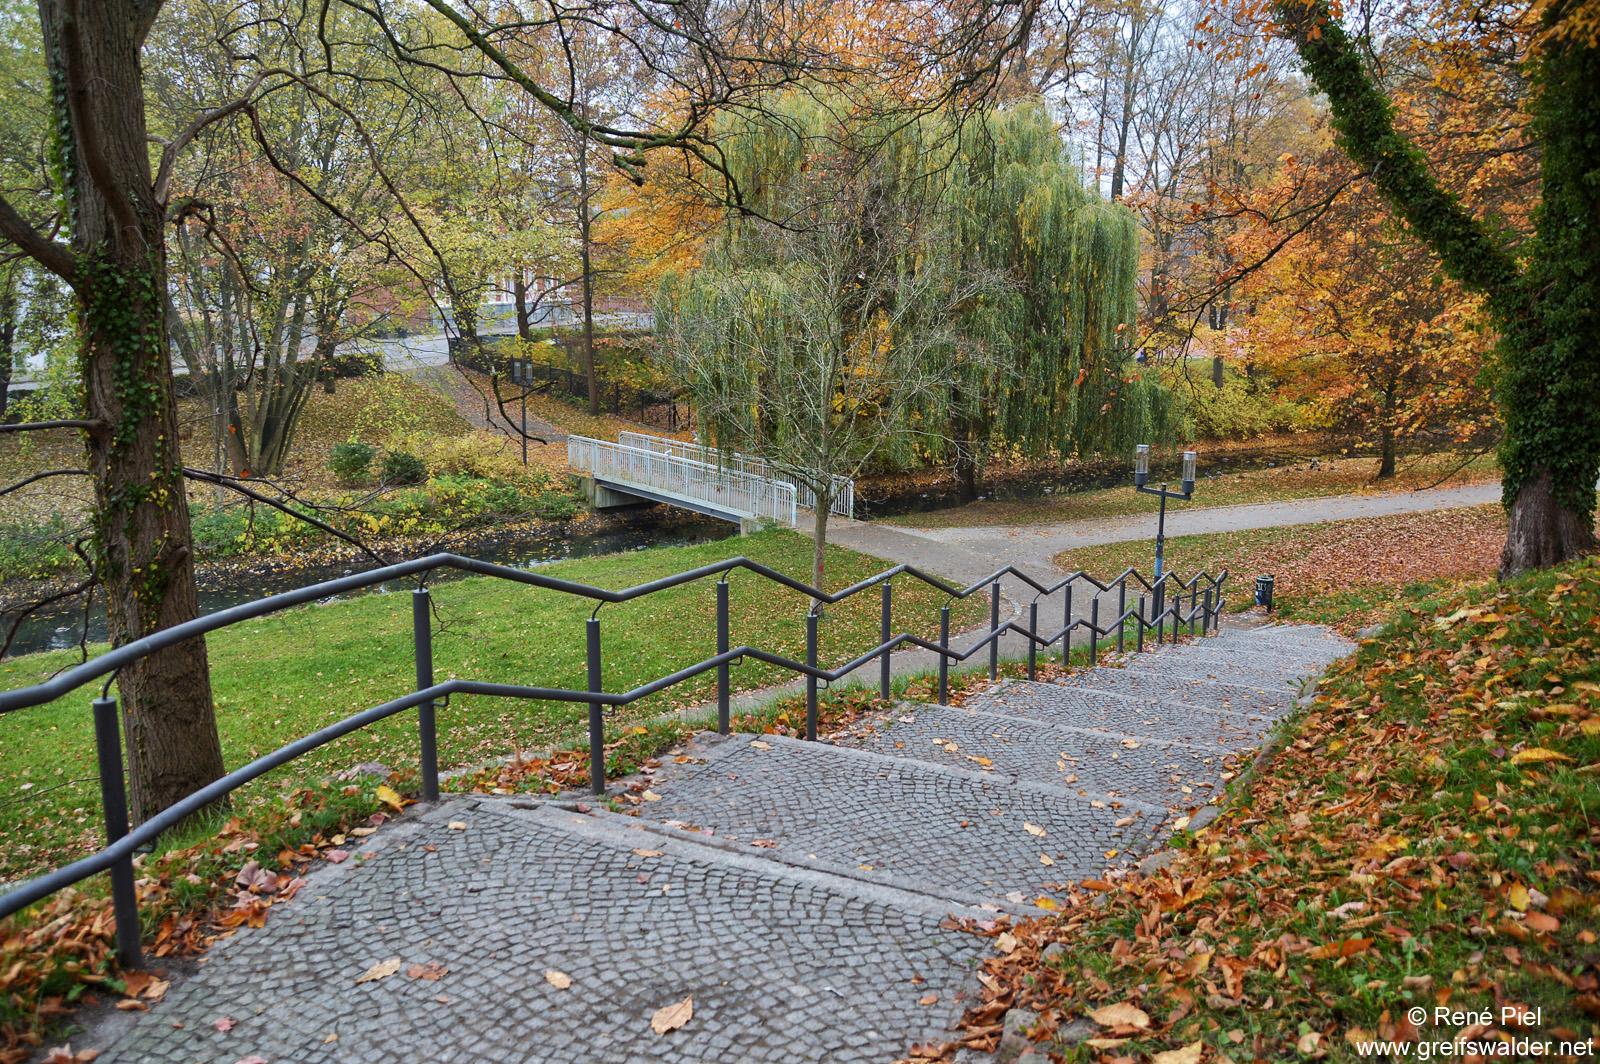 Am Stadtgraben in Greifswald